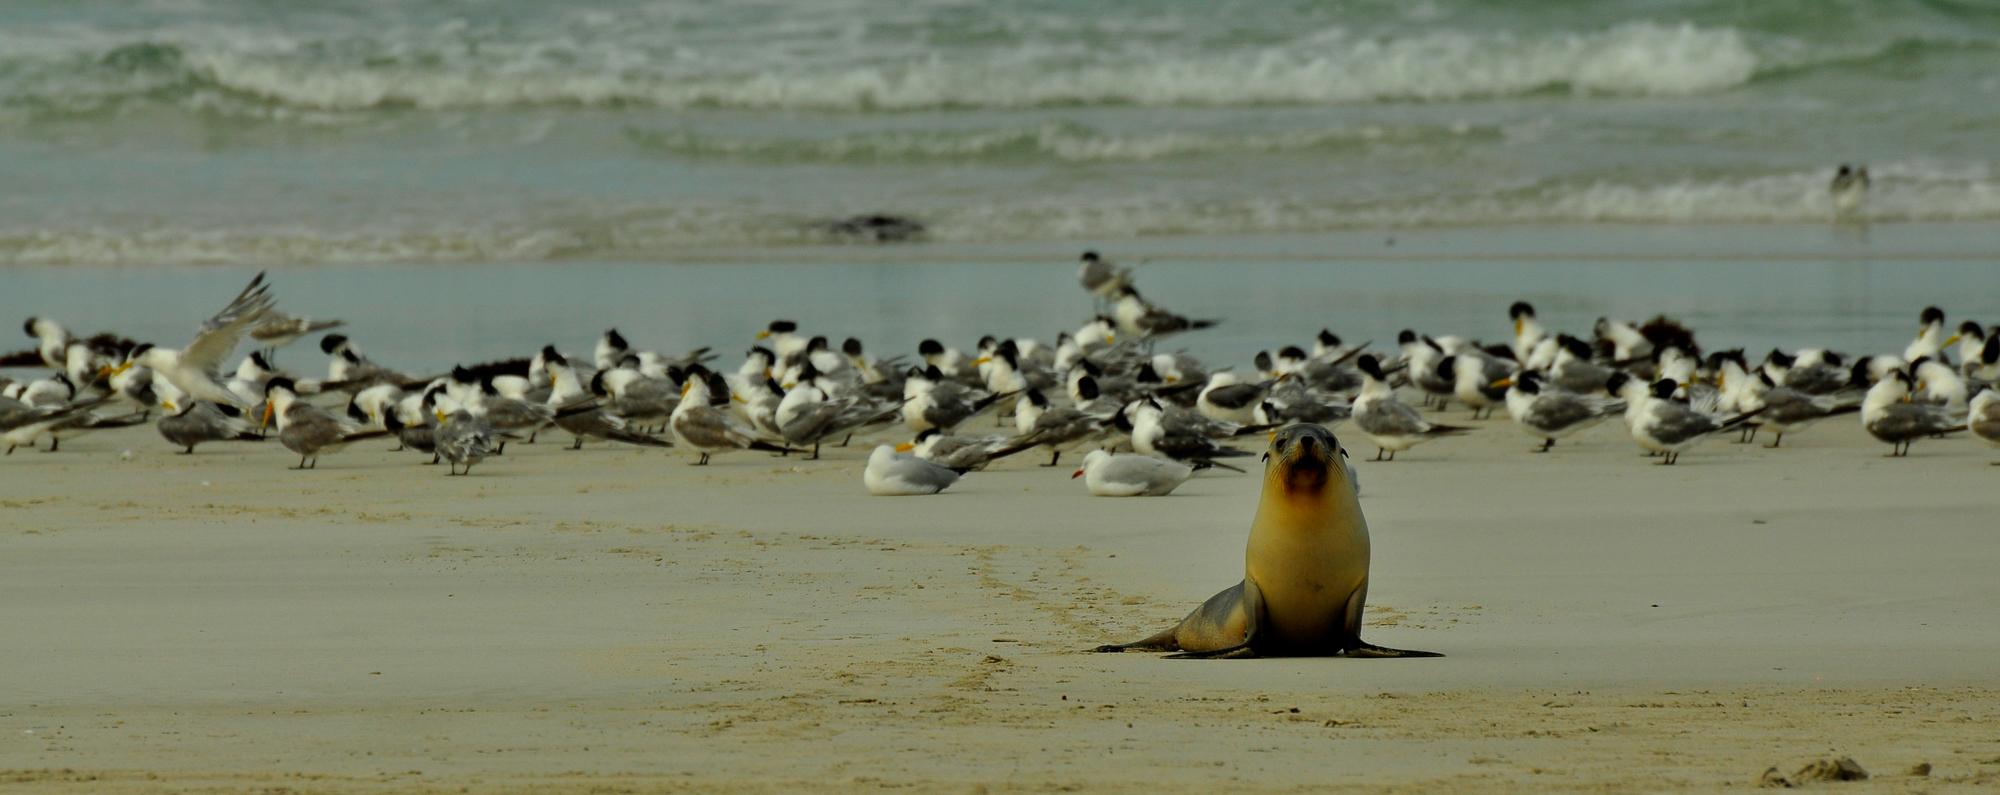 Kangaroo Island, Australia 2010 (M)